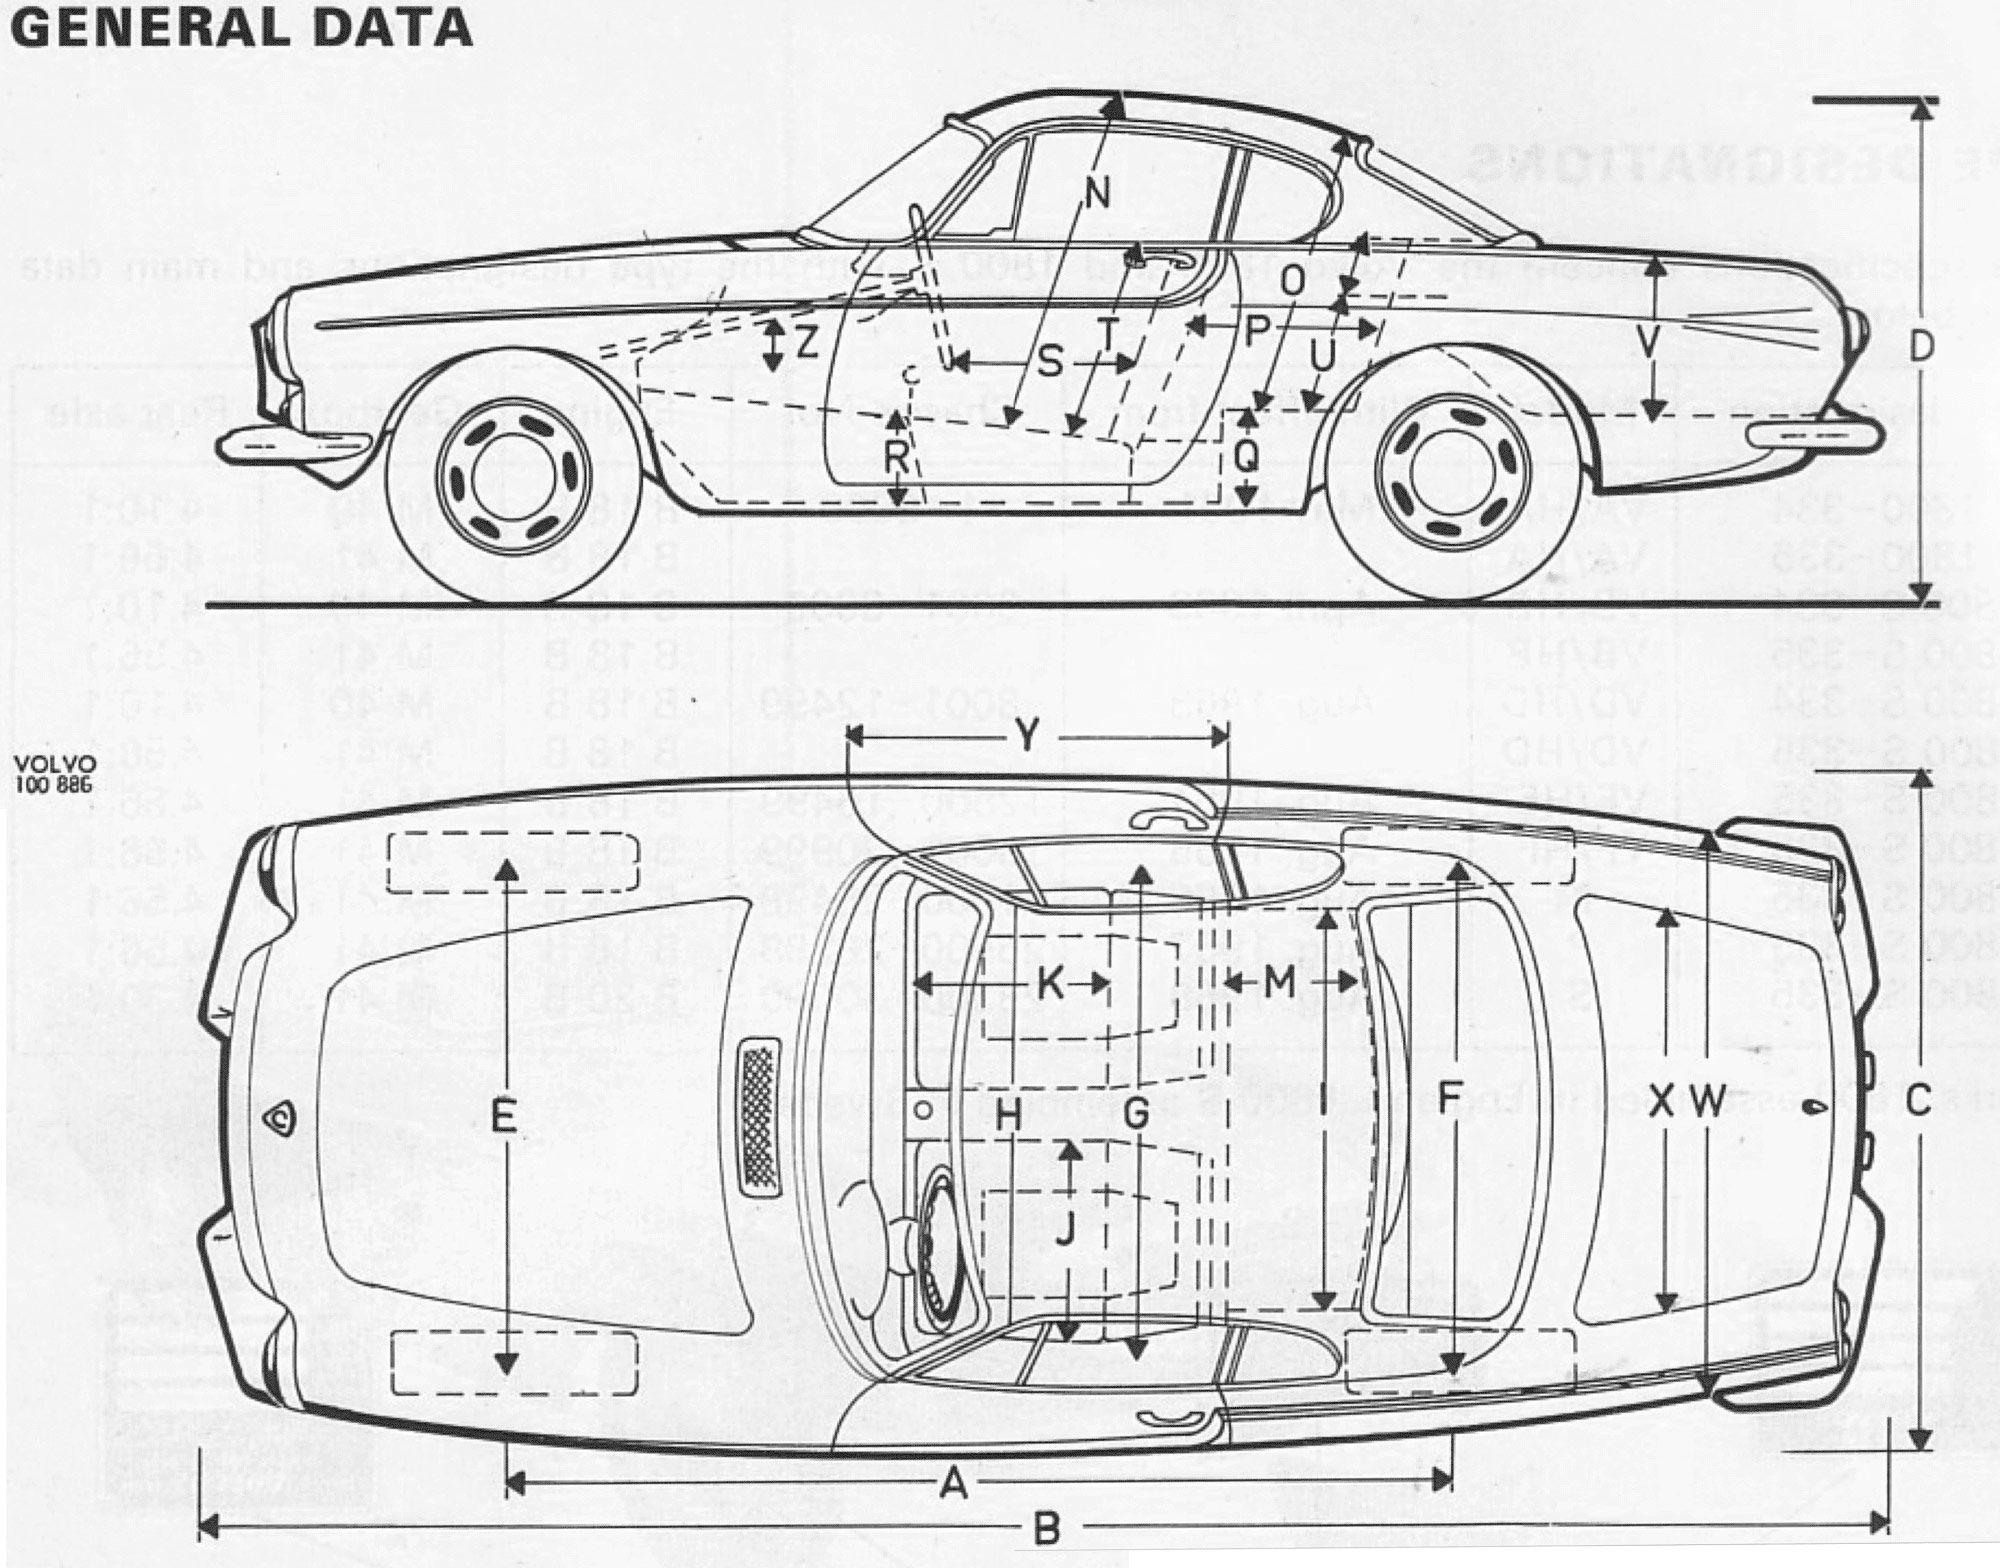 Volvo C70 Dimensions Idee D Image De Voiture